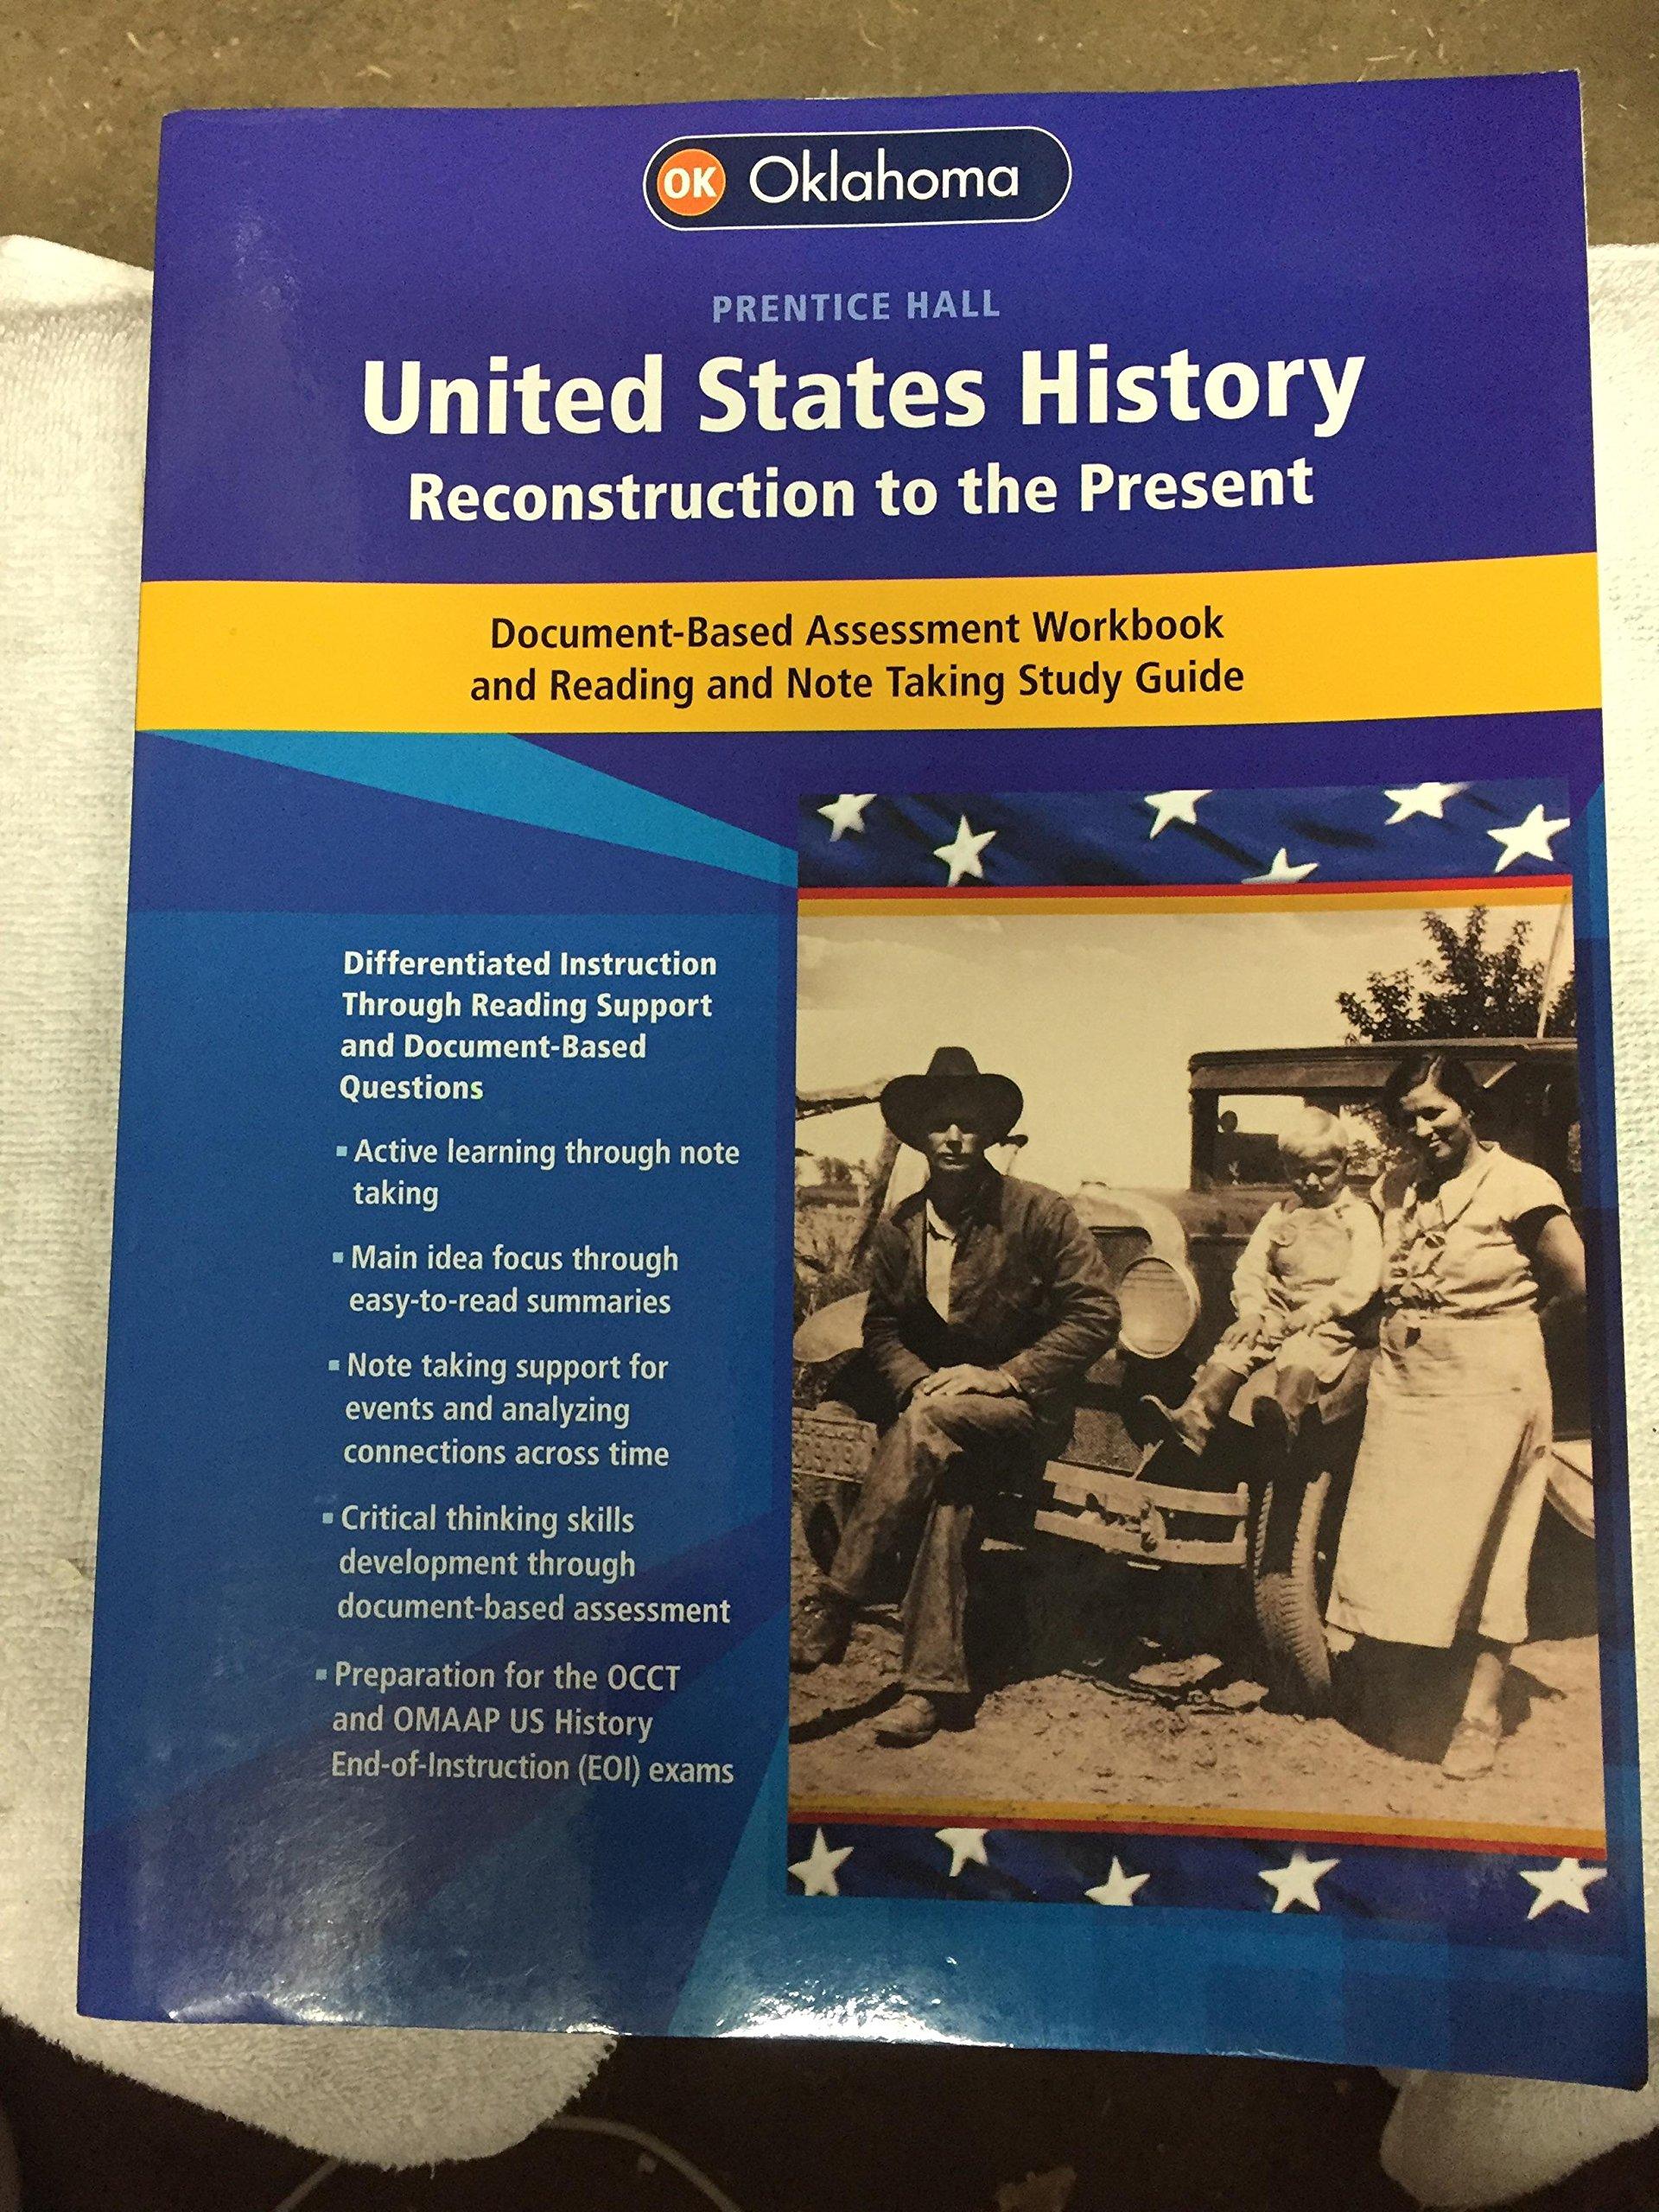 United States History Reconstruction to the Present: Oklahoma: Pearson  Prentice Hall: 9780133242096: Amazon.com: Books